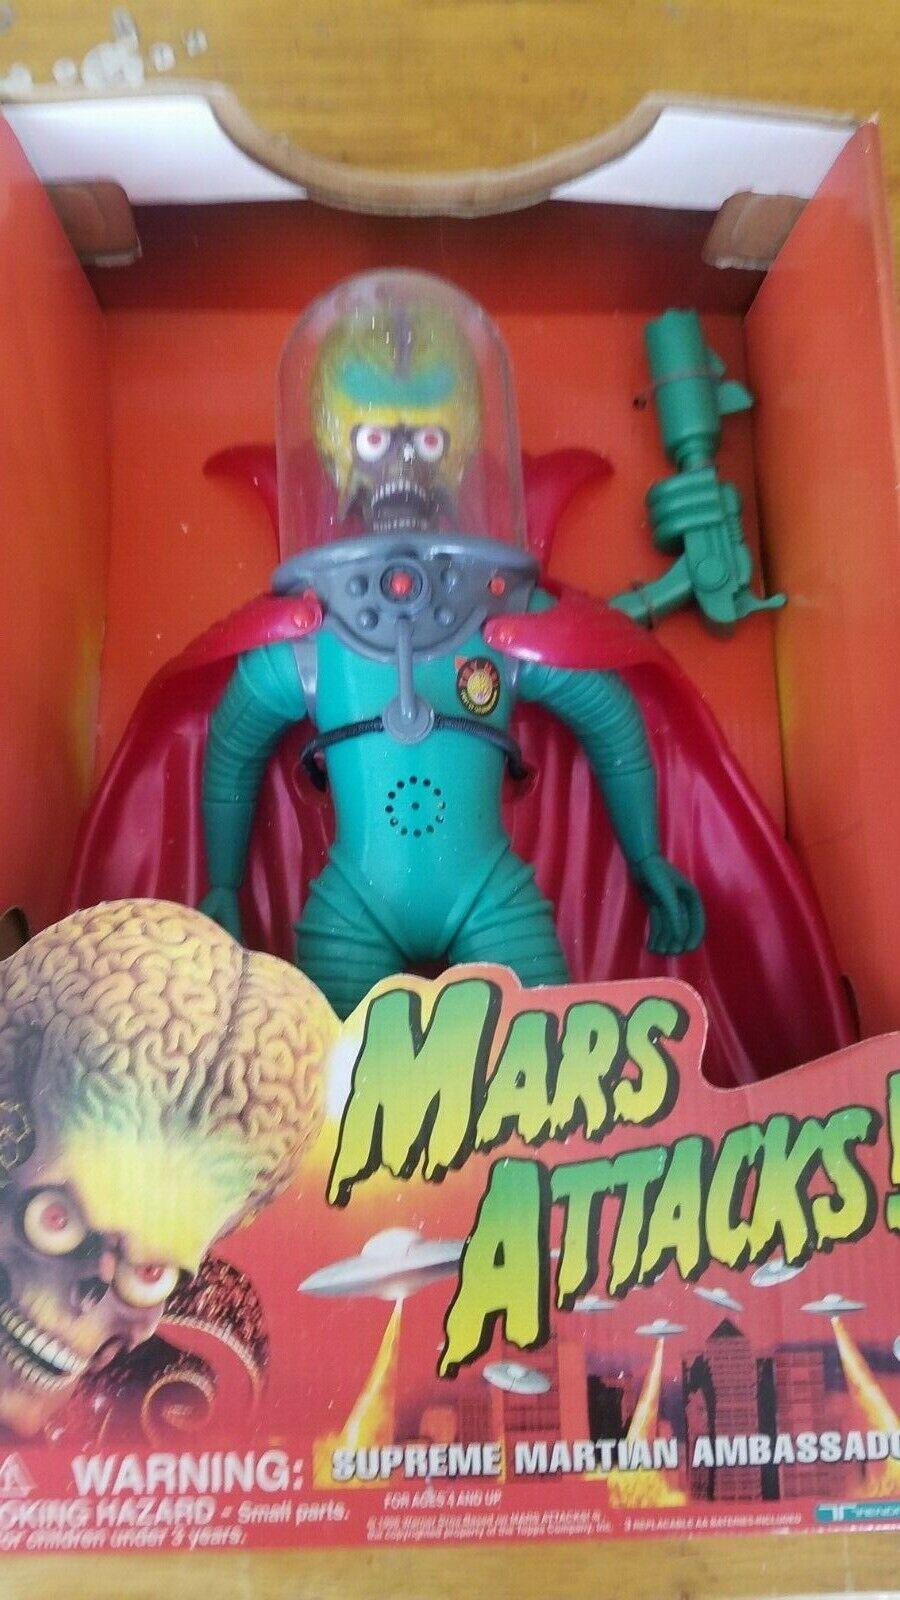 Jahr Mars Attacks Supreme Martian Ambassador 1996 Trendmasters